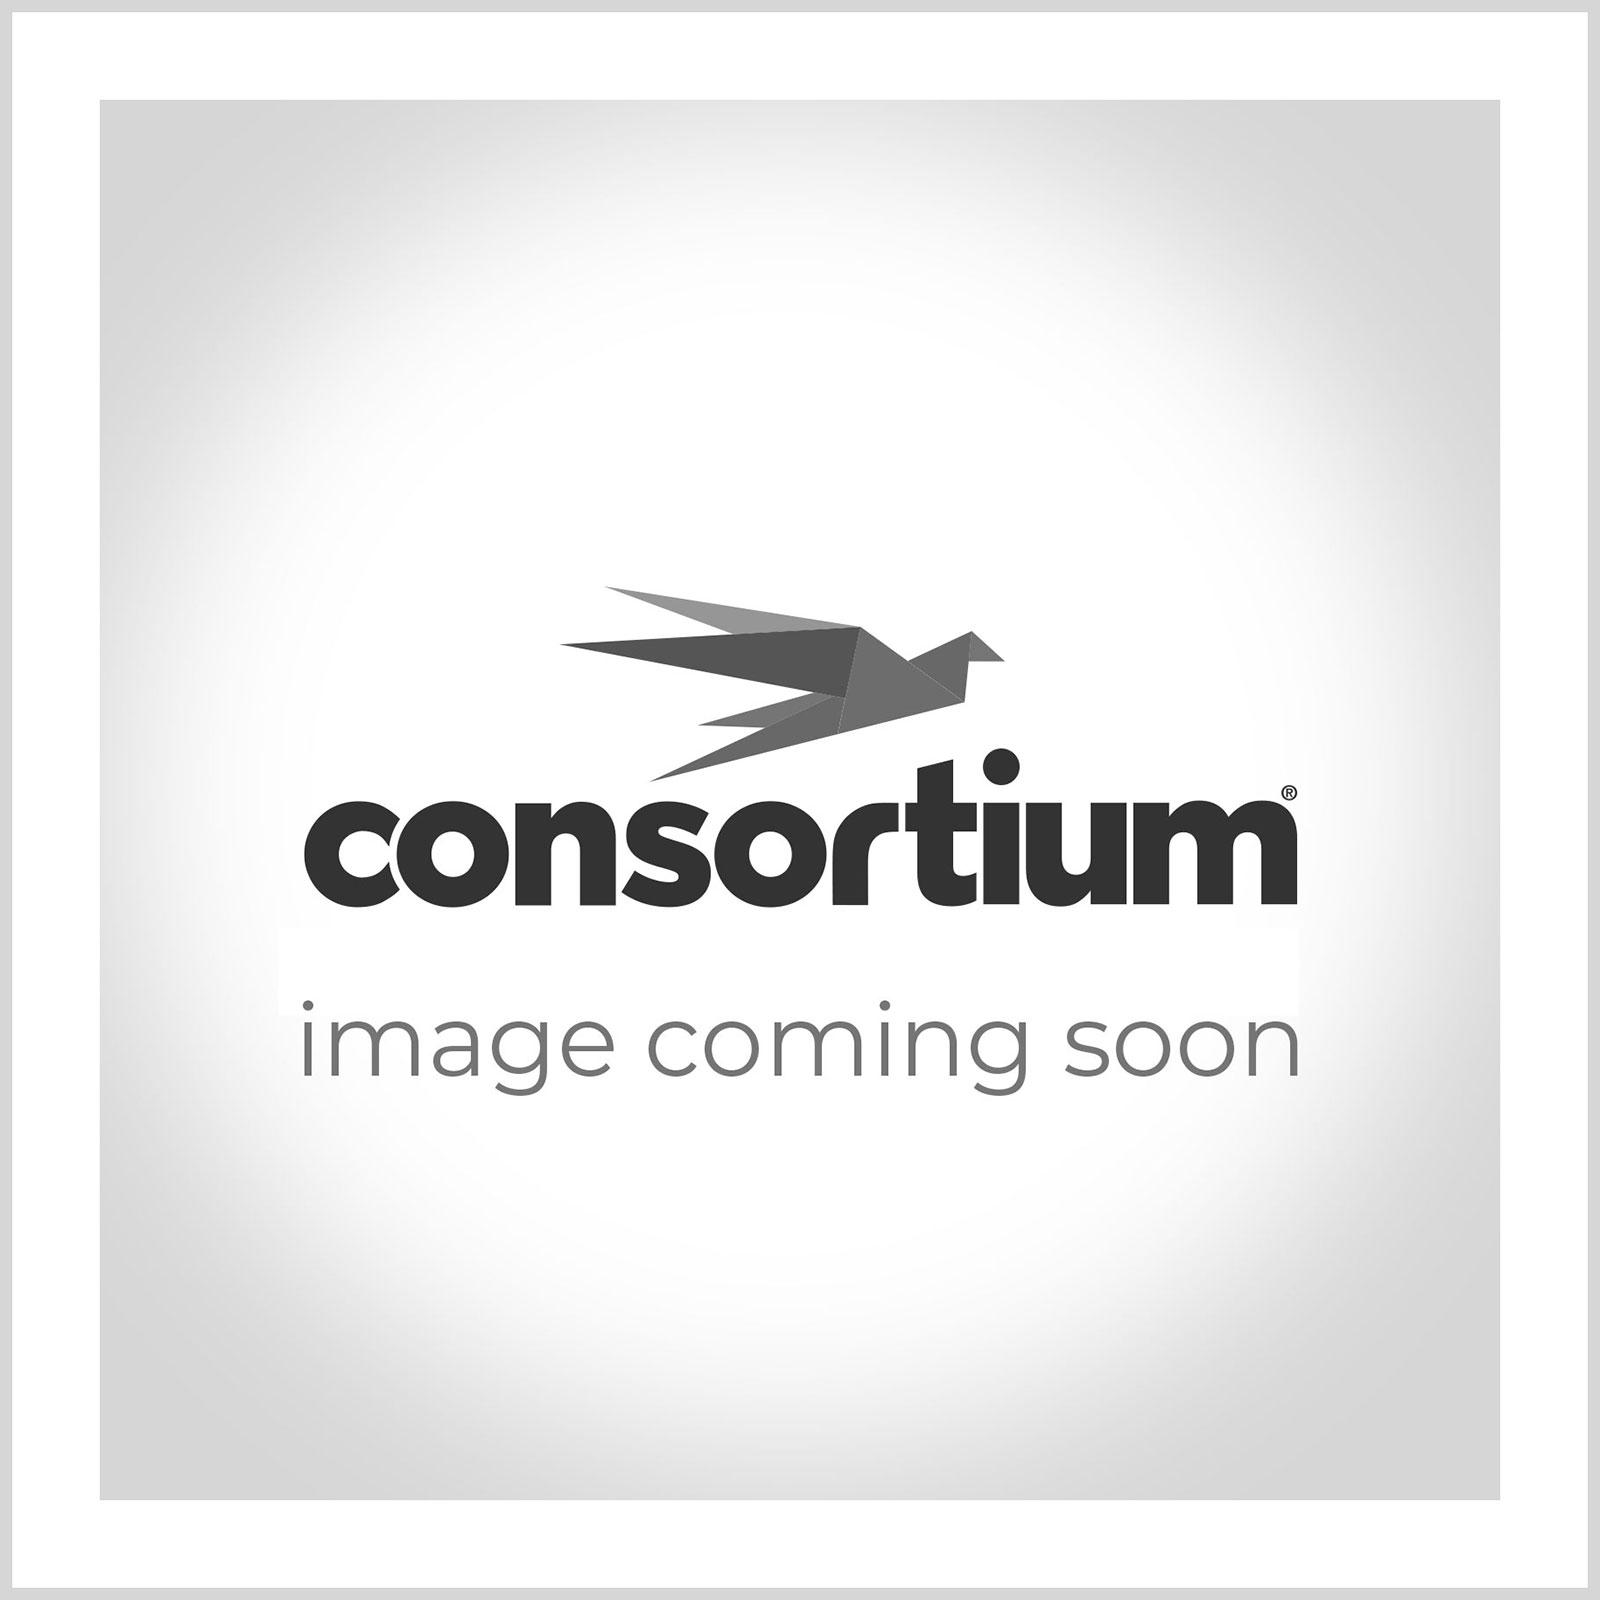 Consortium Play Sand